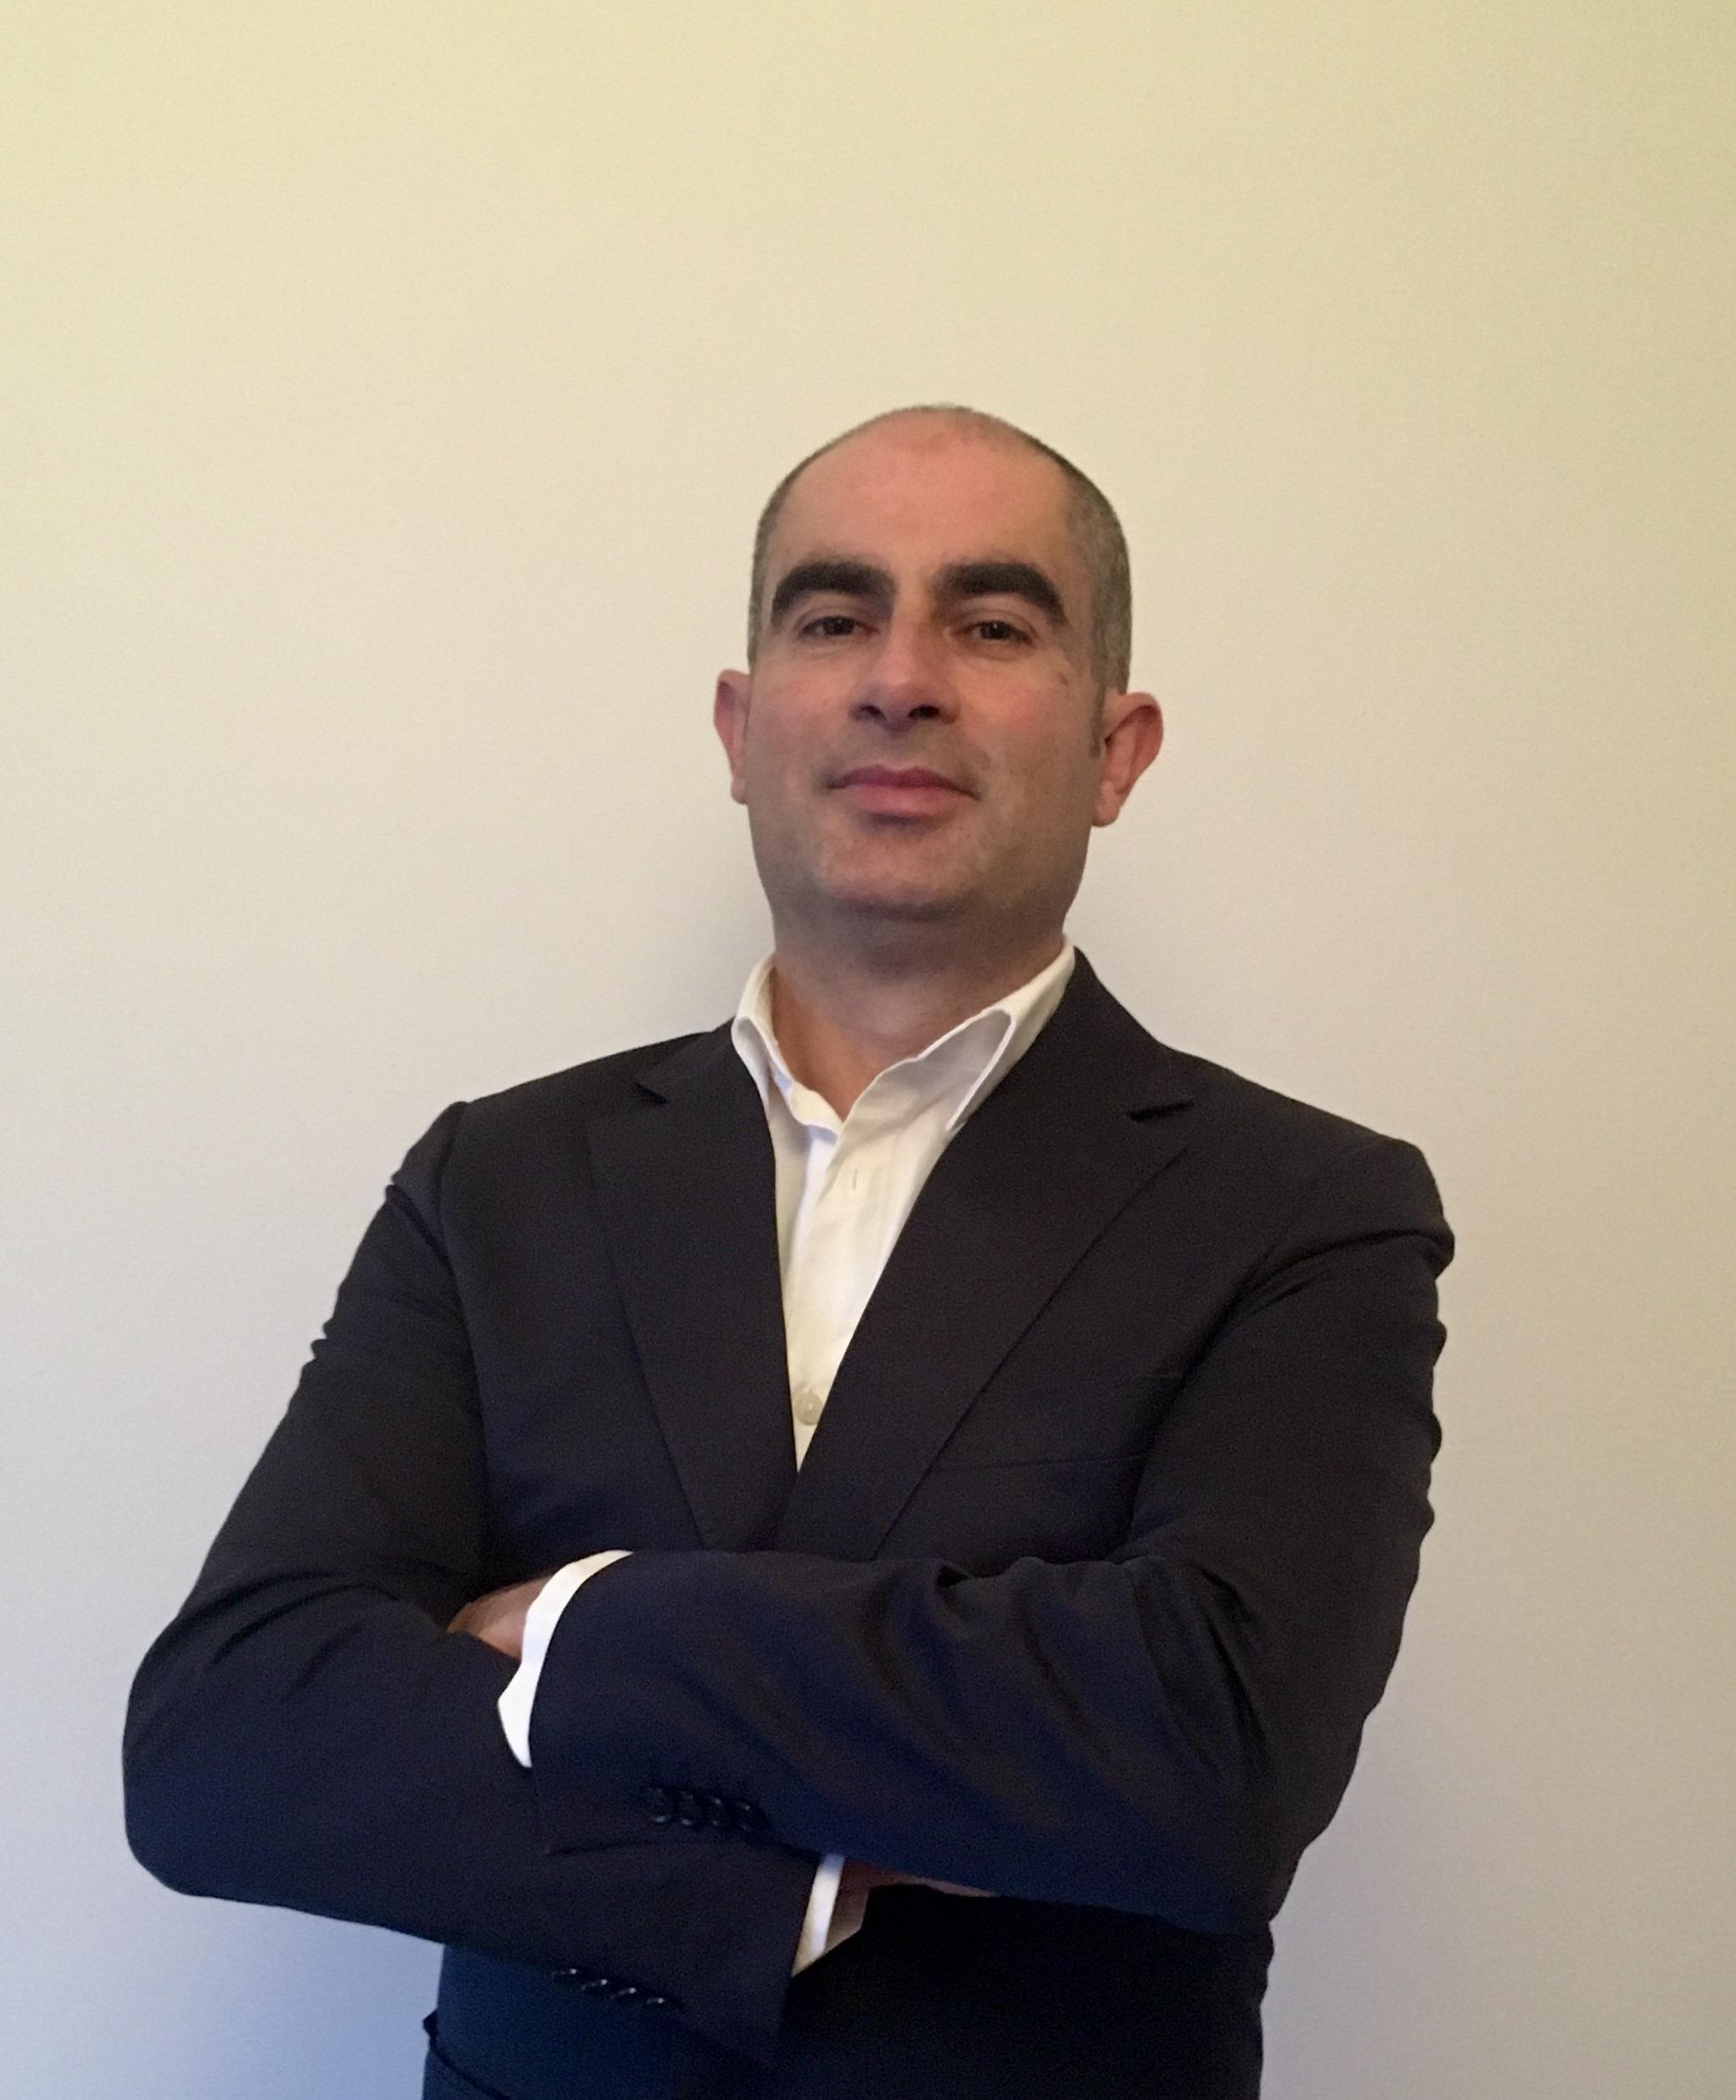 Patrício Oliveira